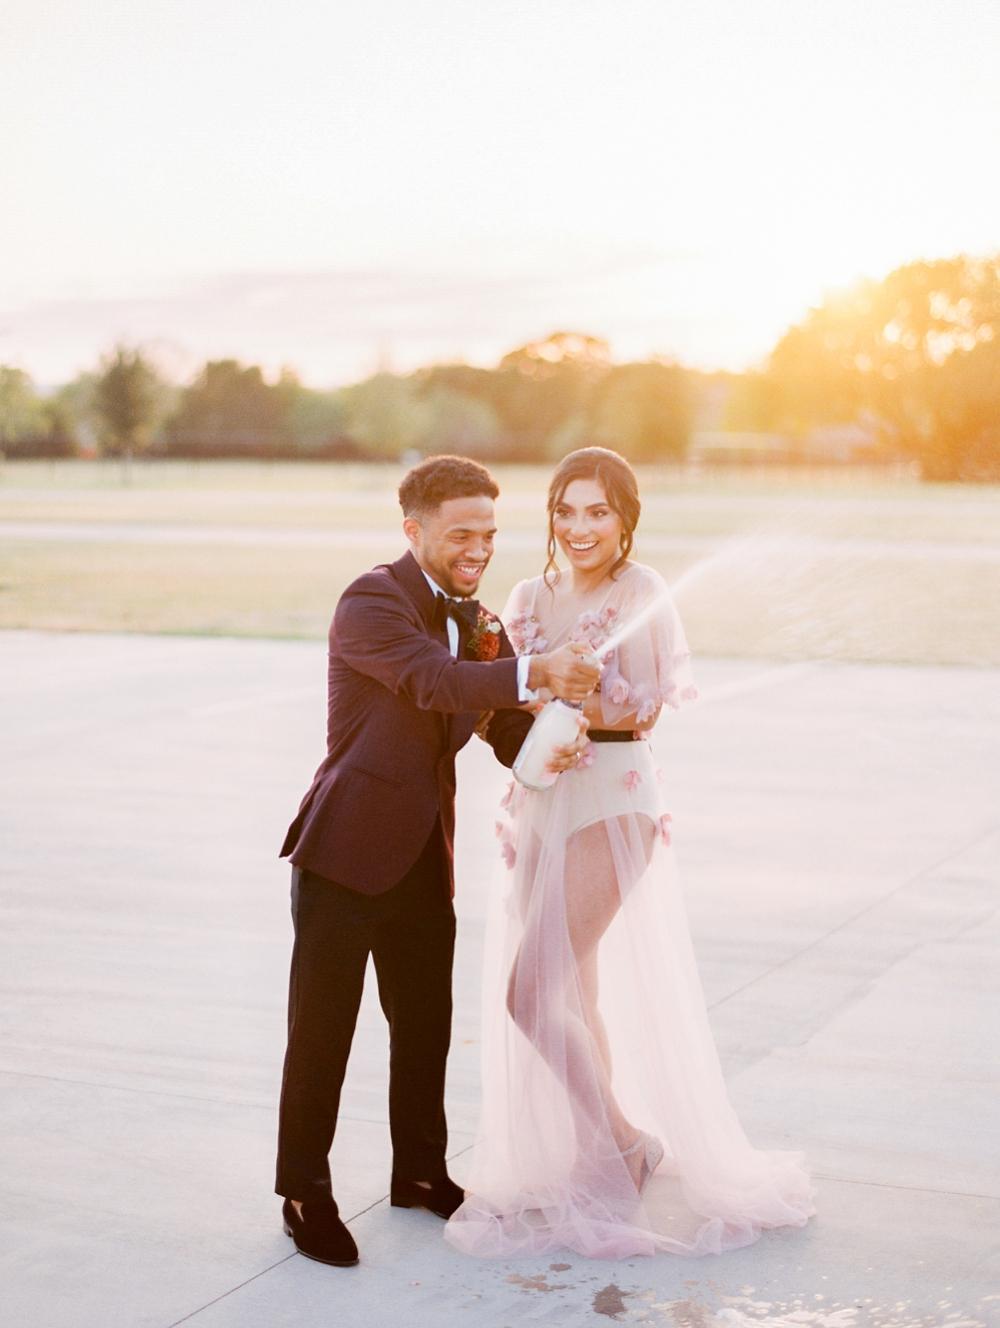 kristin-la-voie-photography-TEXAS-Wedding-Photographer-THE-OLANA-DALLAS-FINE-ART-97